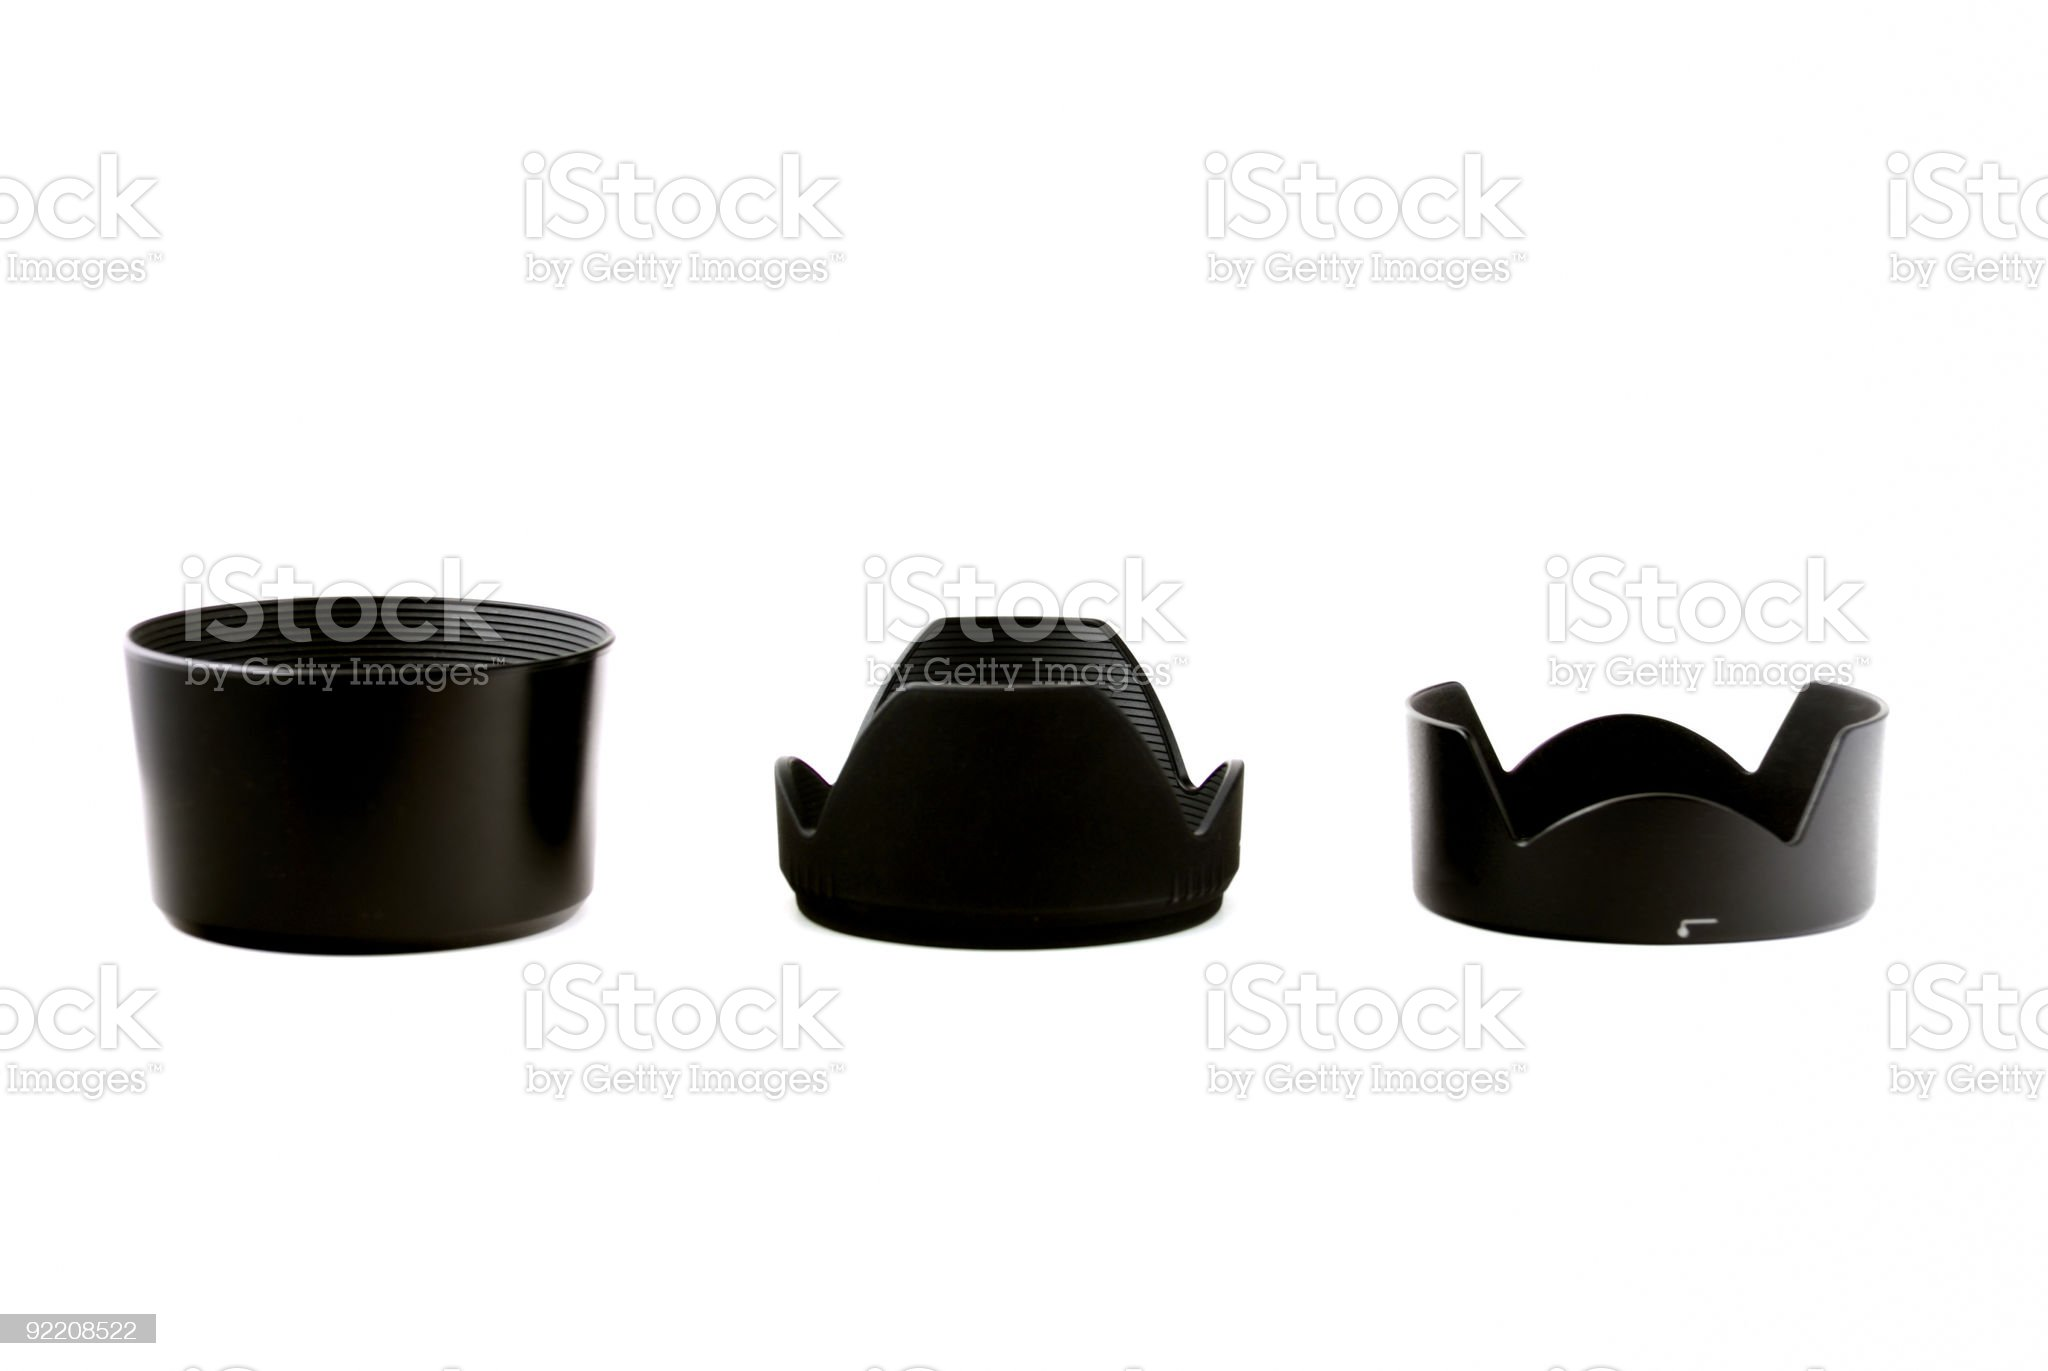 Lens hood royalty-free stock photo